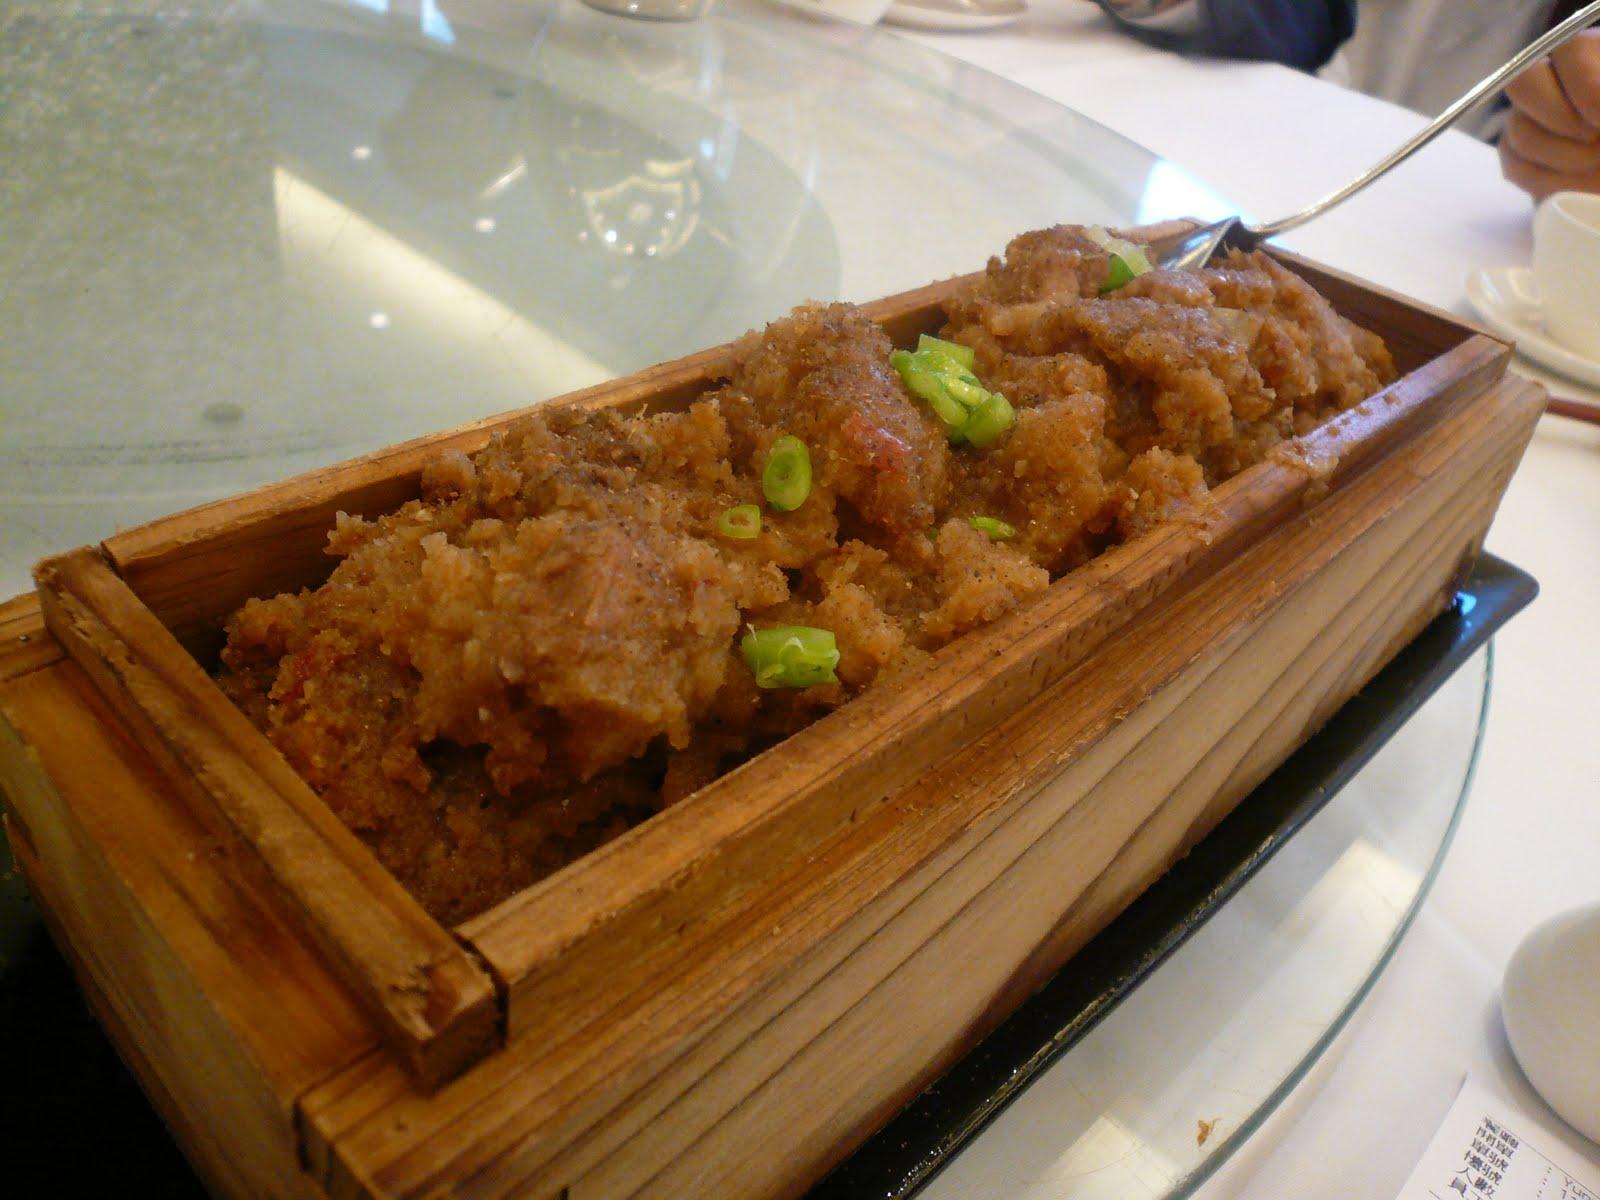 Fabrice 嚐味: 雲陽閣 - 新裝的百味菜館